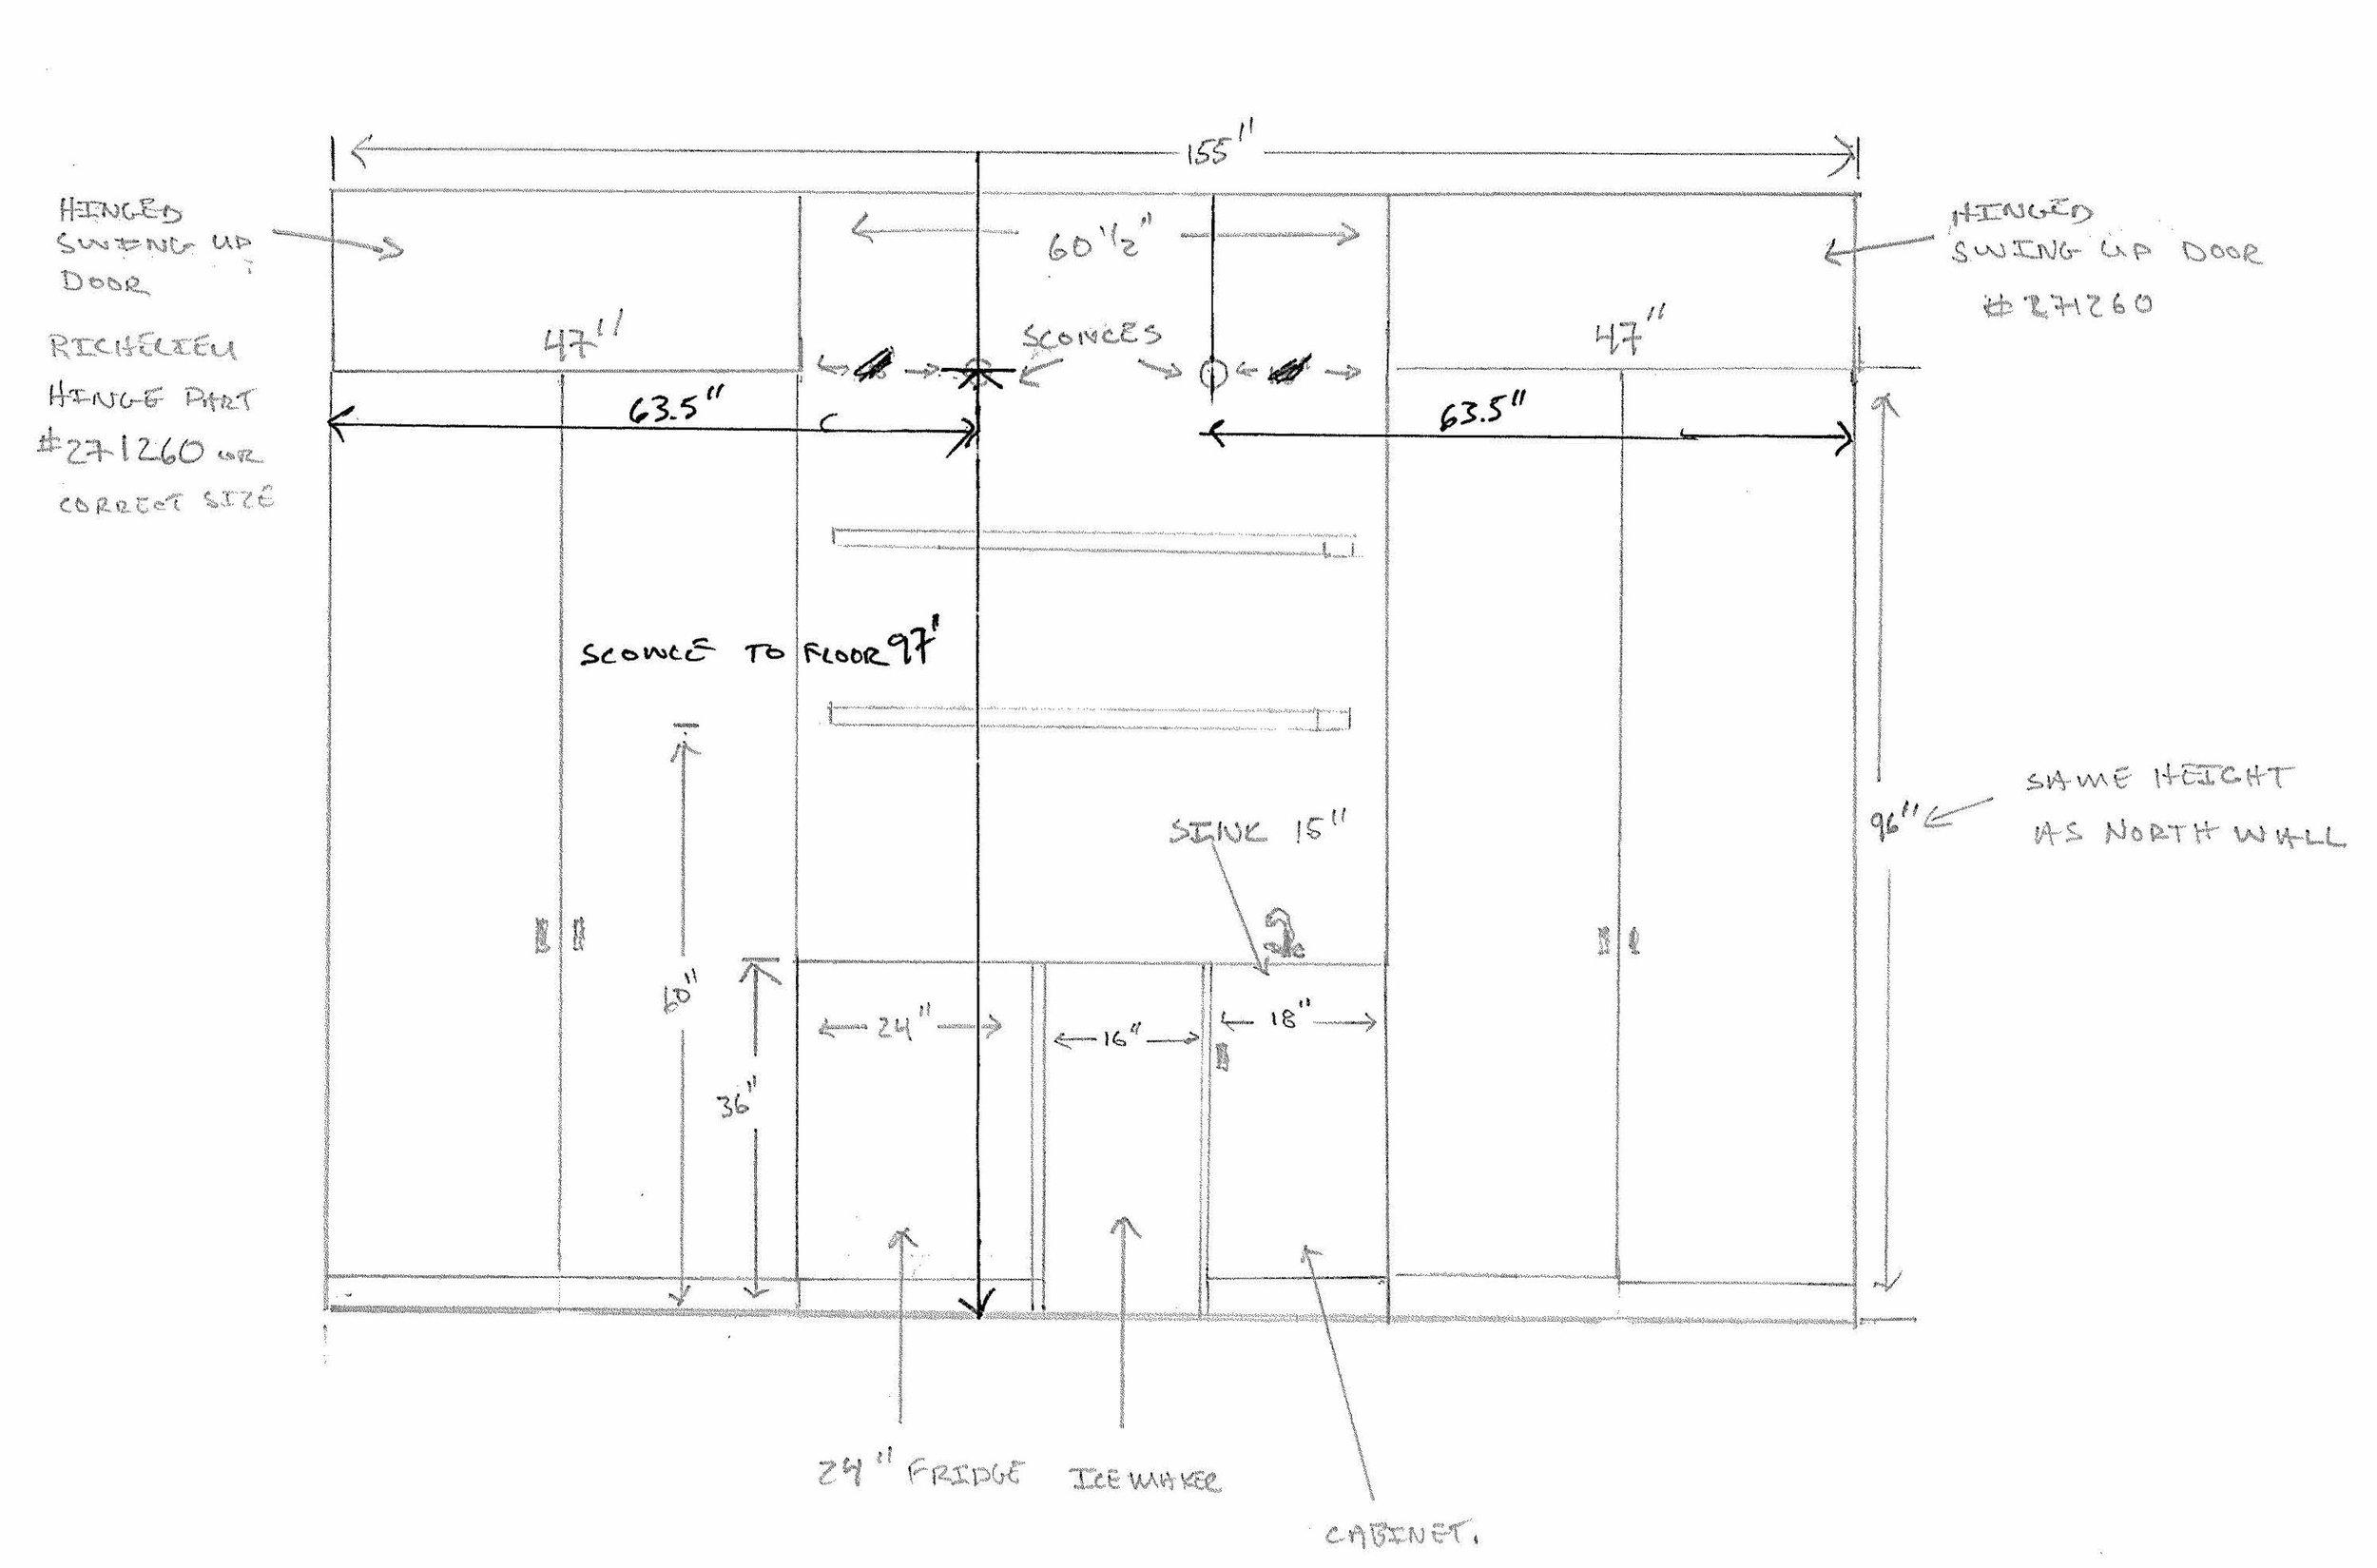 rwr kitchen drawing_Page_1.jpg